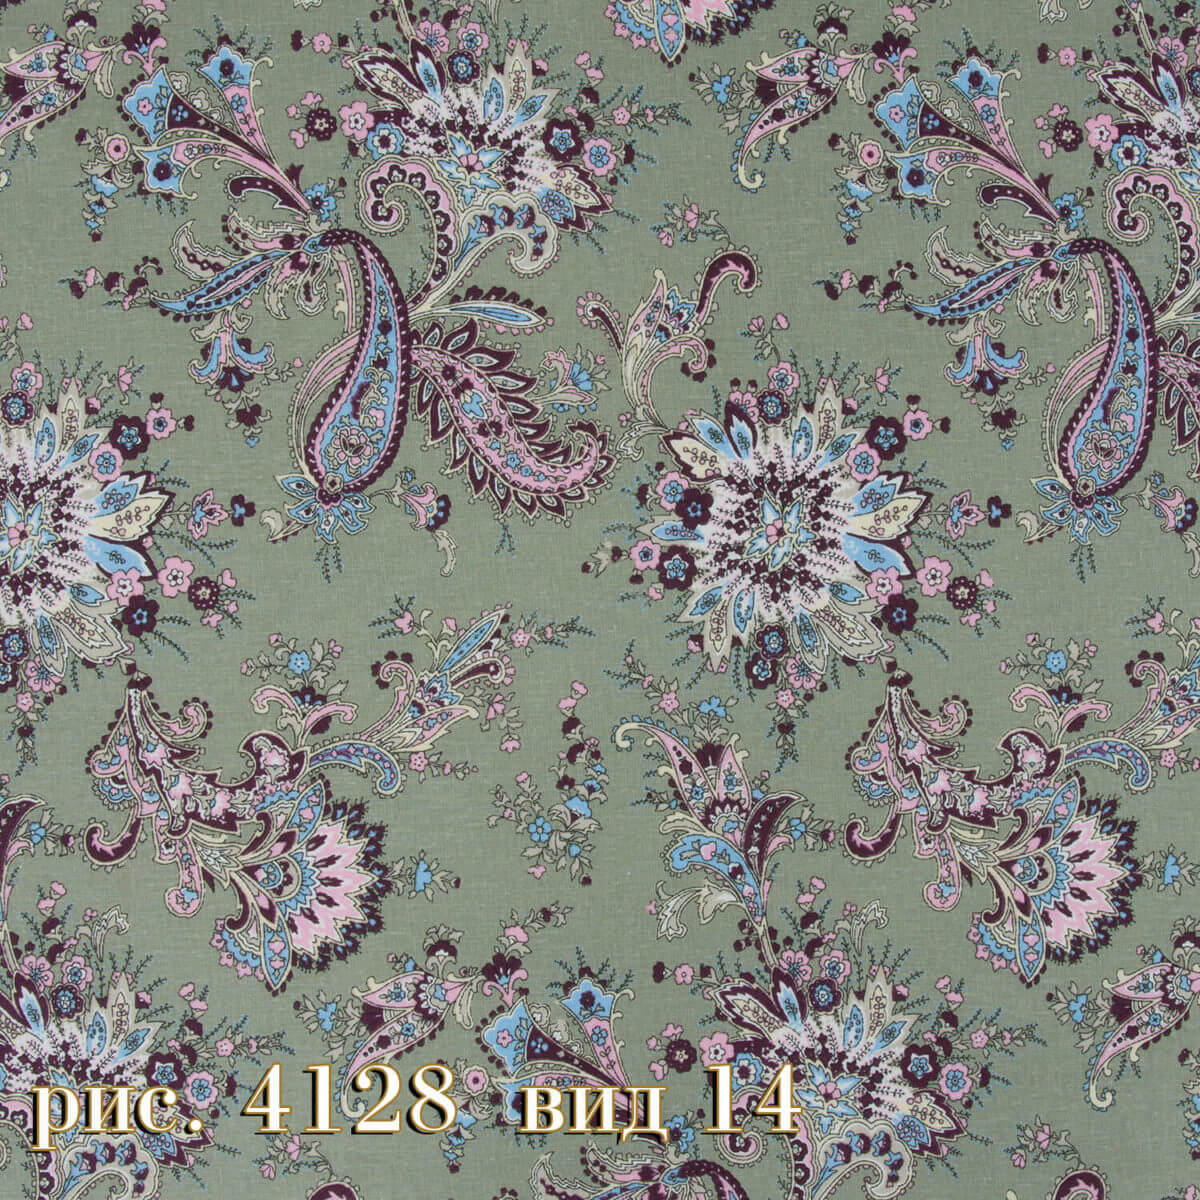 Фото 24 - Плательная ткань бязь 150 см (4128/14) Под заказ.